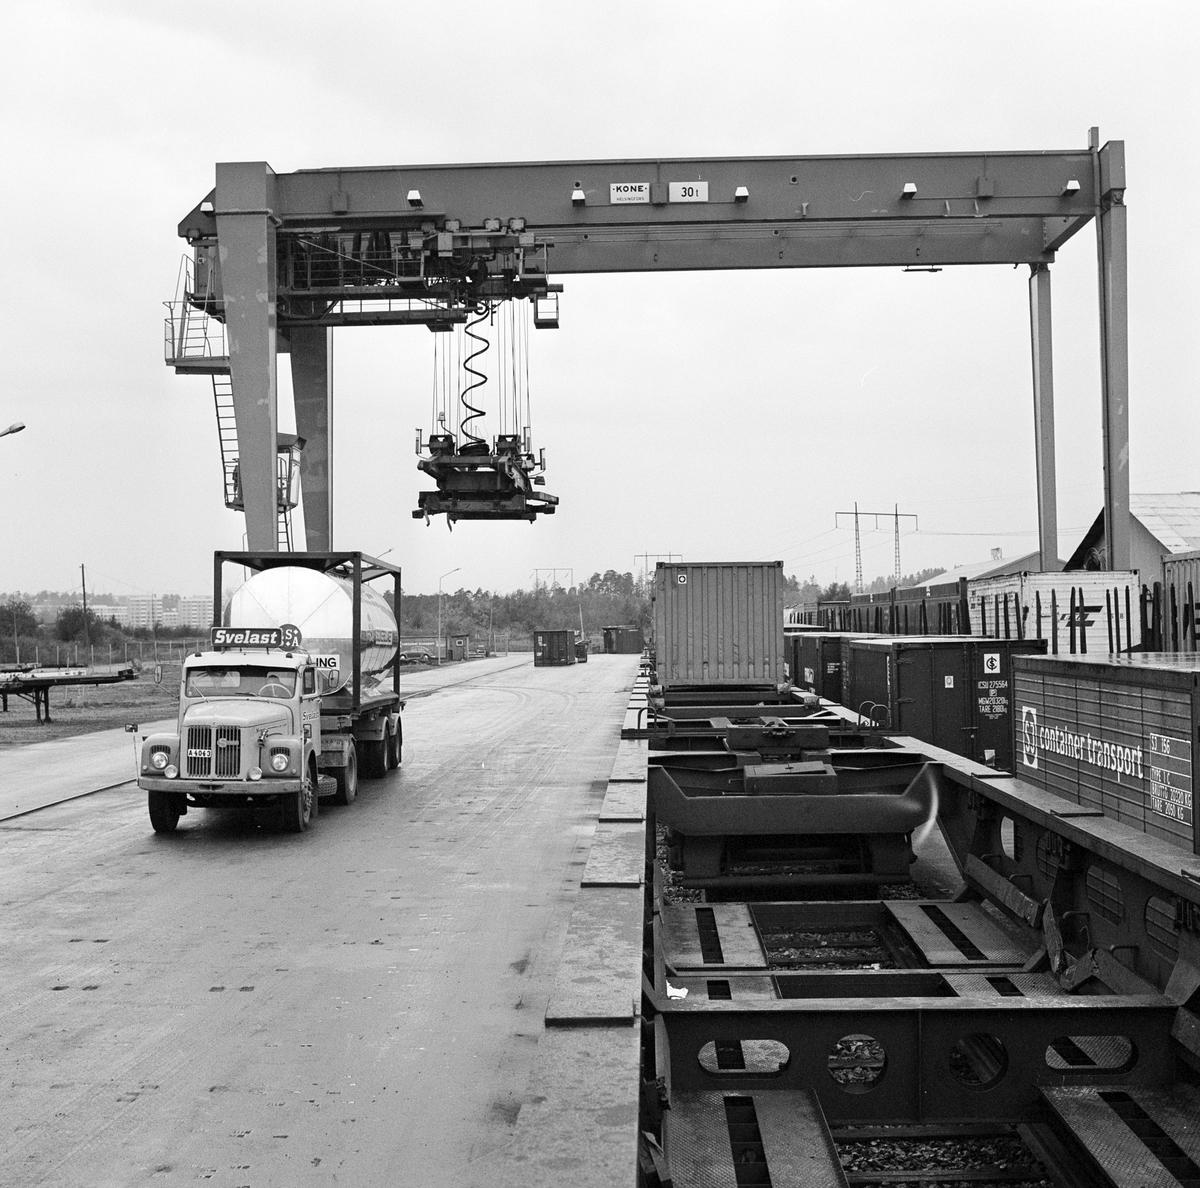 Solnaterminalen. Containertransport